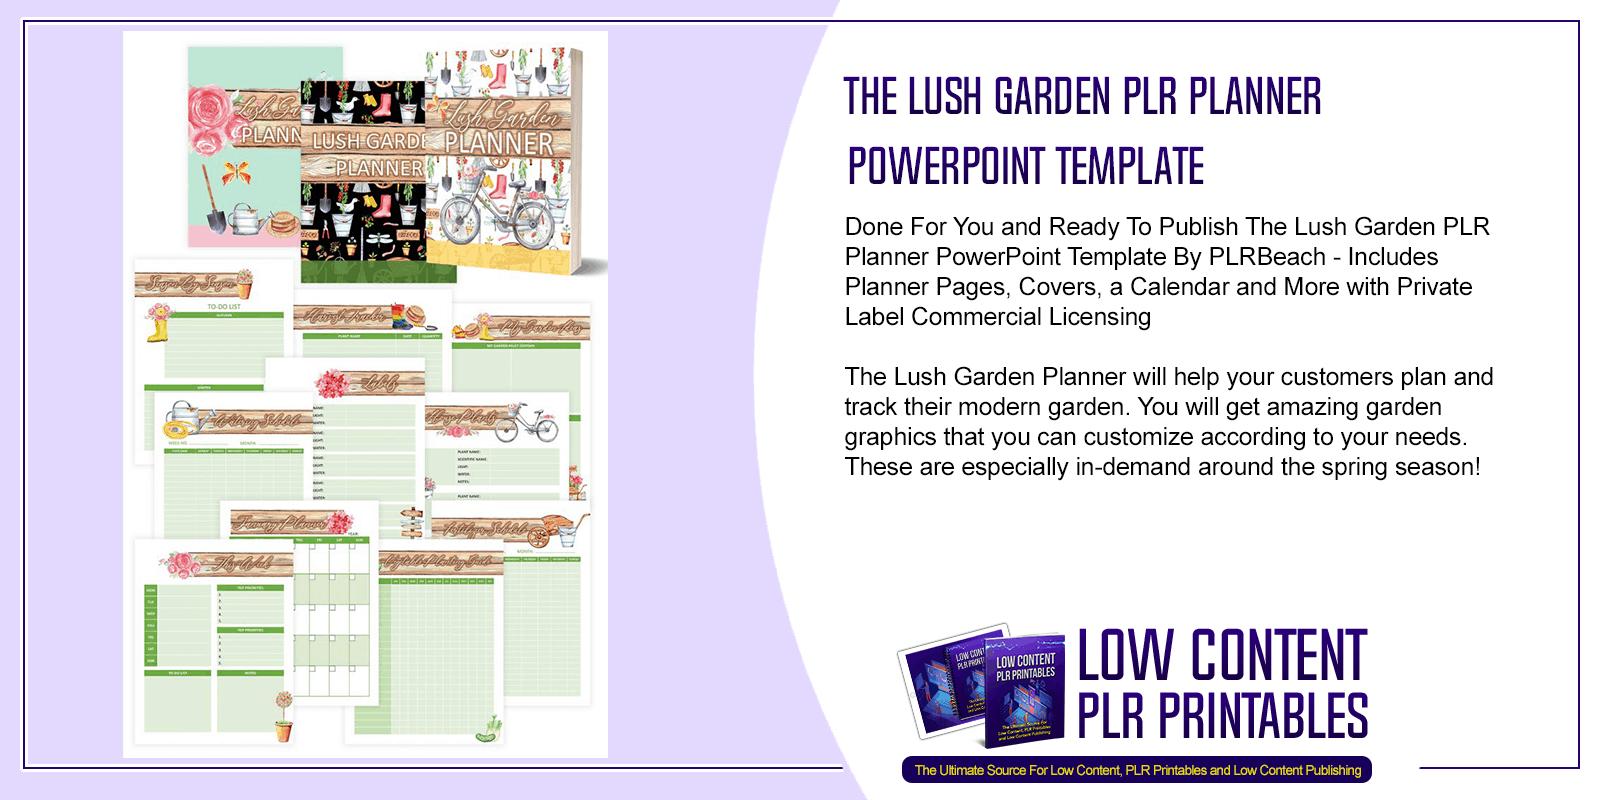 The Lush Garden PLR Planner PowerPoint Template